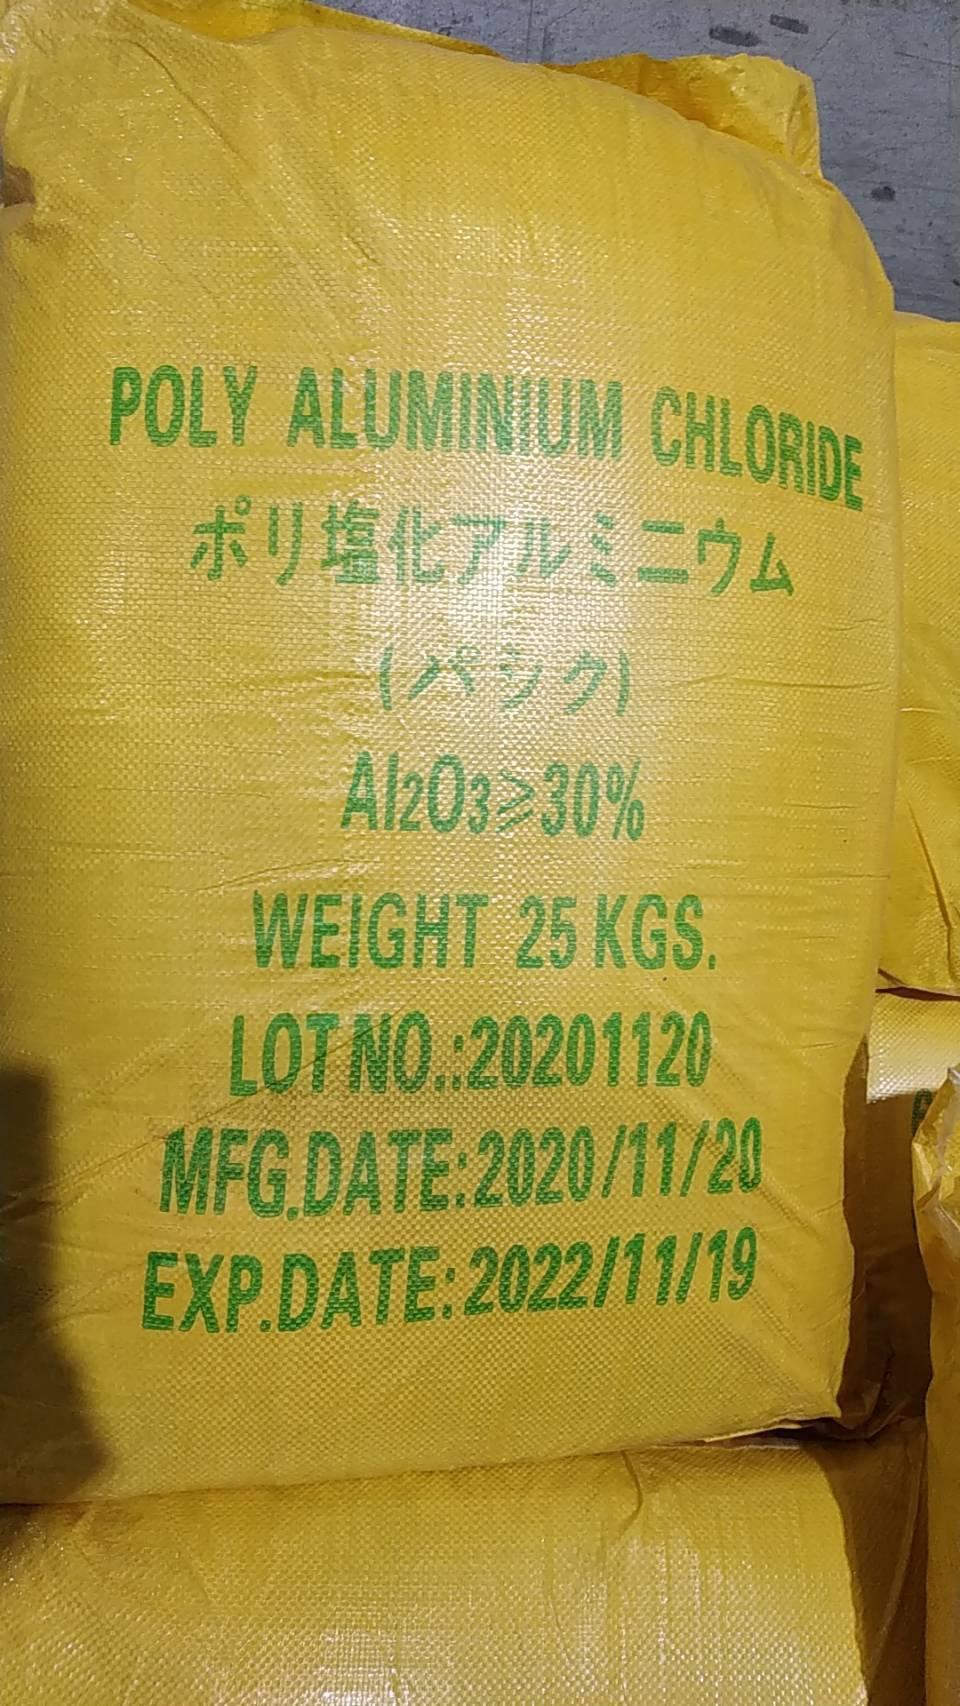 POLY AMMONIUM CHLORIDE (PAC)